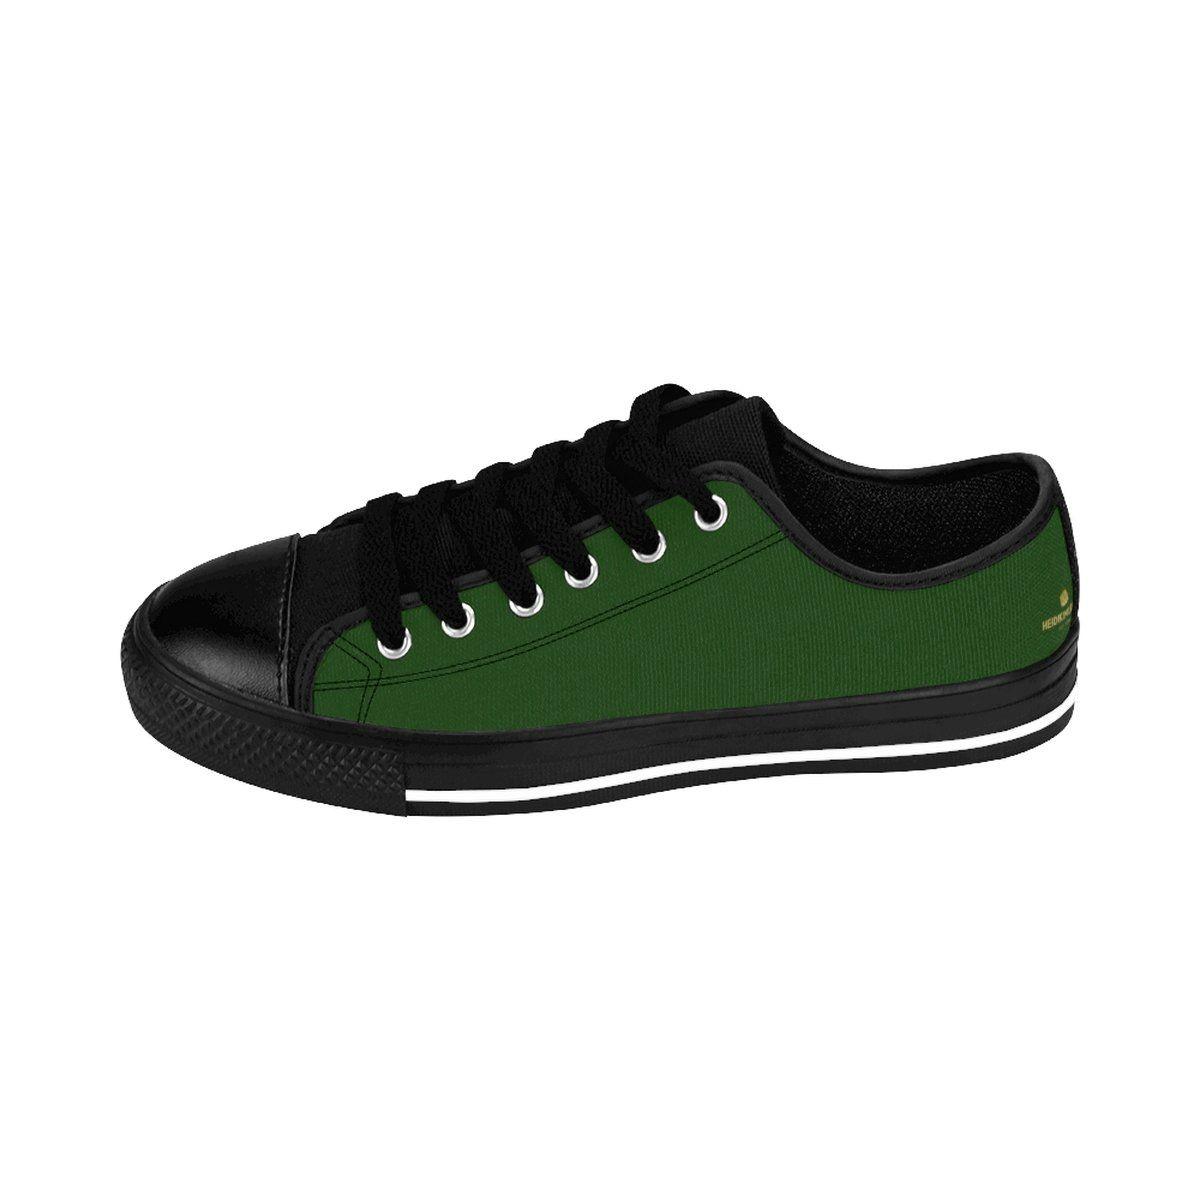 Green Men's Low Tops, Seattle Emerald